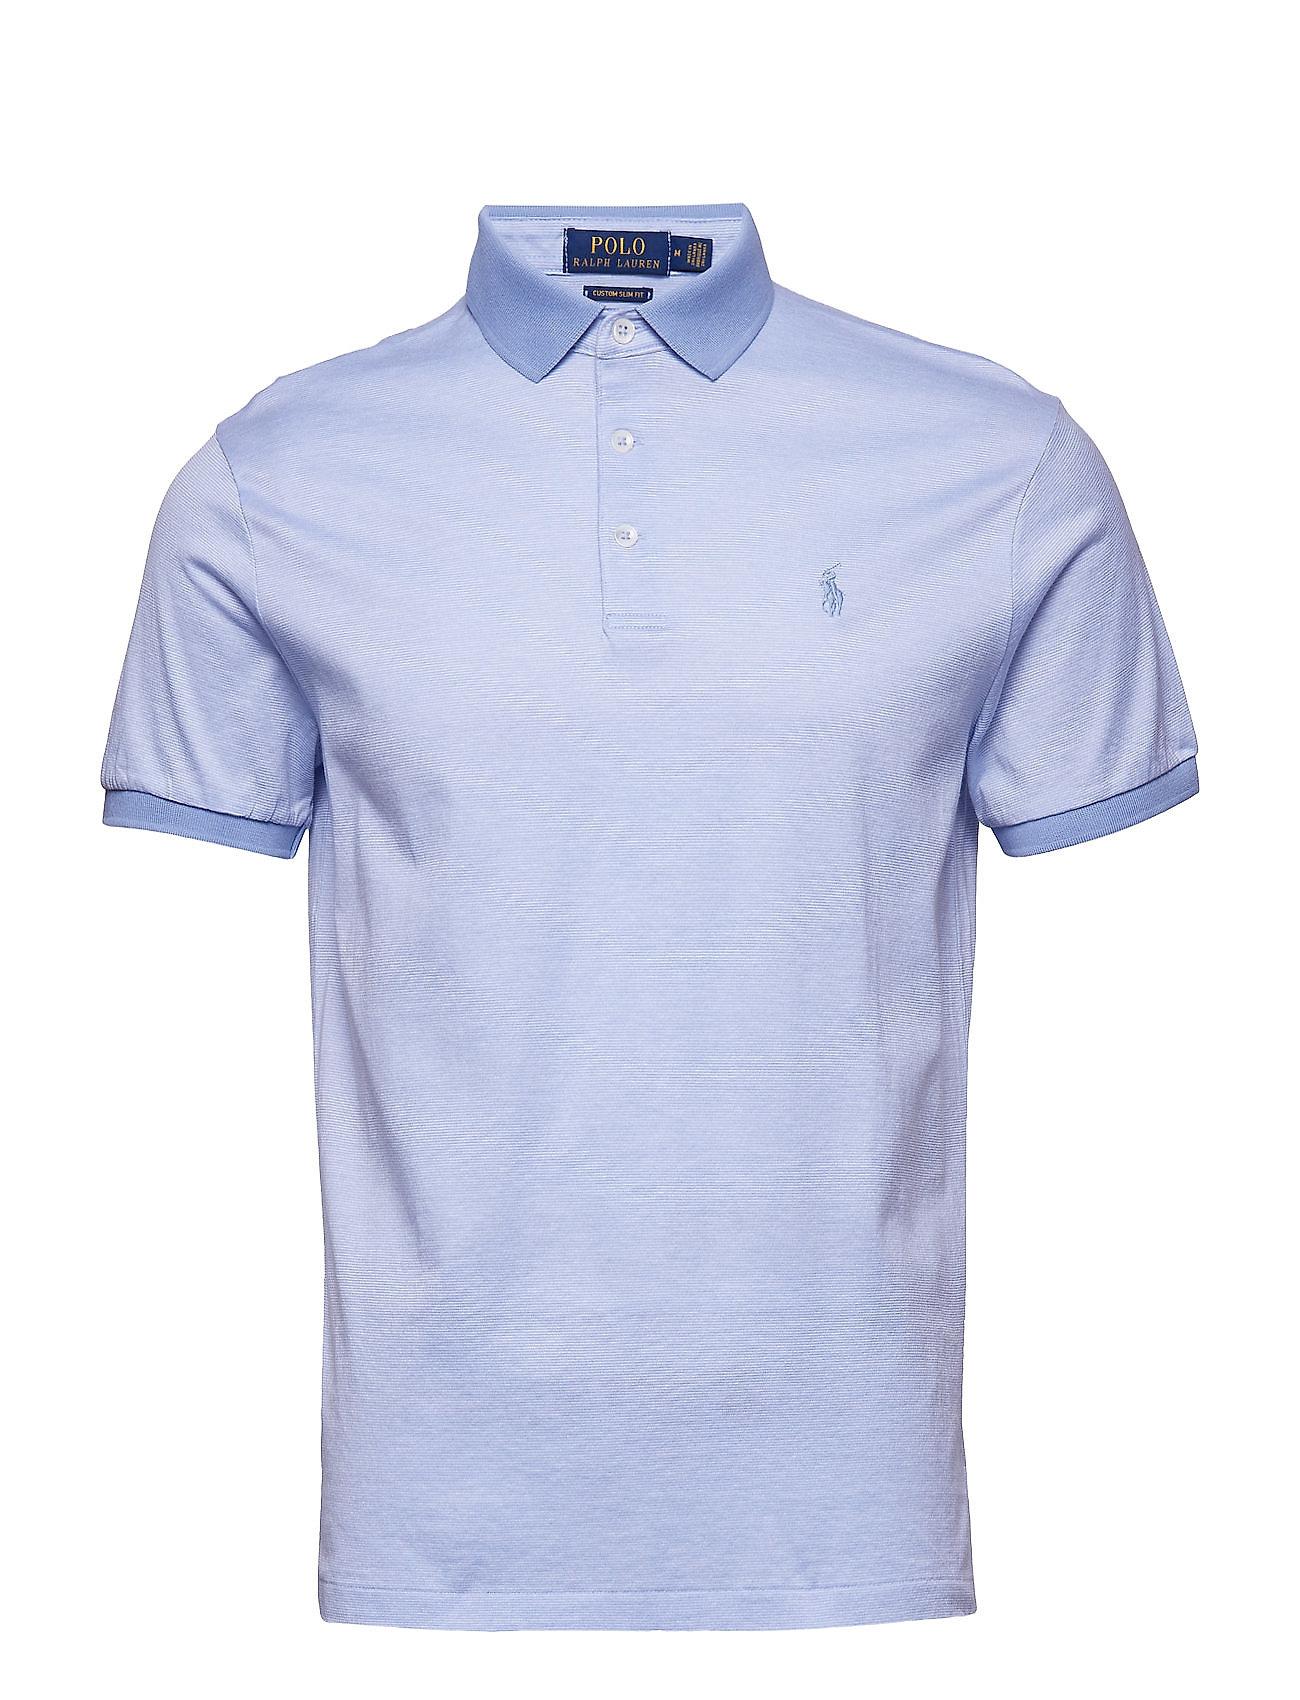 Sskccmslm2-short Sleeve-knit (Dress Shirt Blue ) (£109) - Polo Ralph ... 96f4e2238eaf